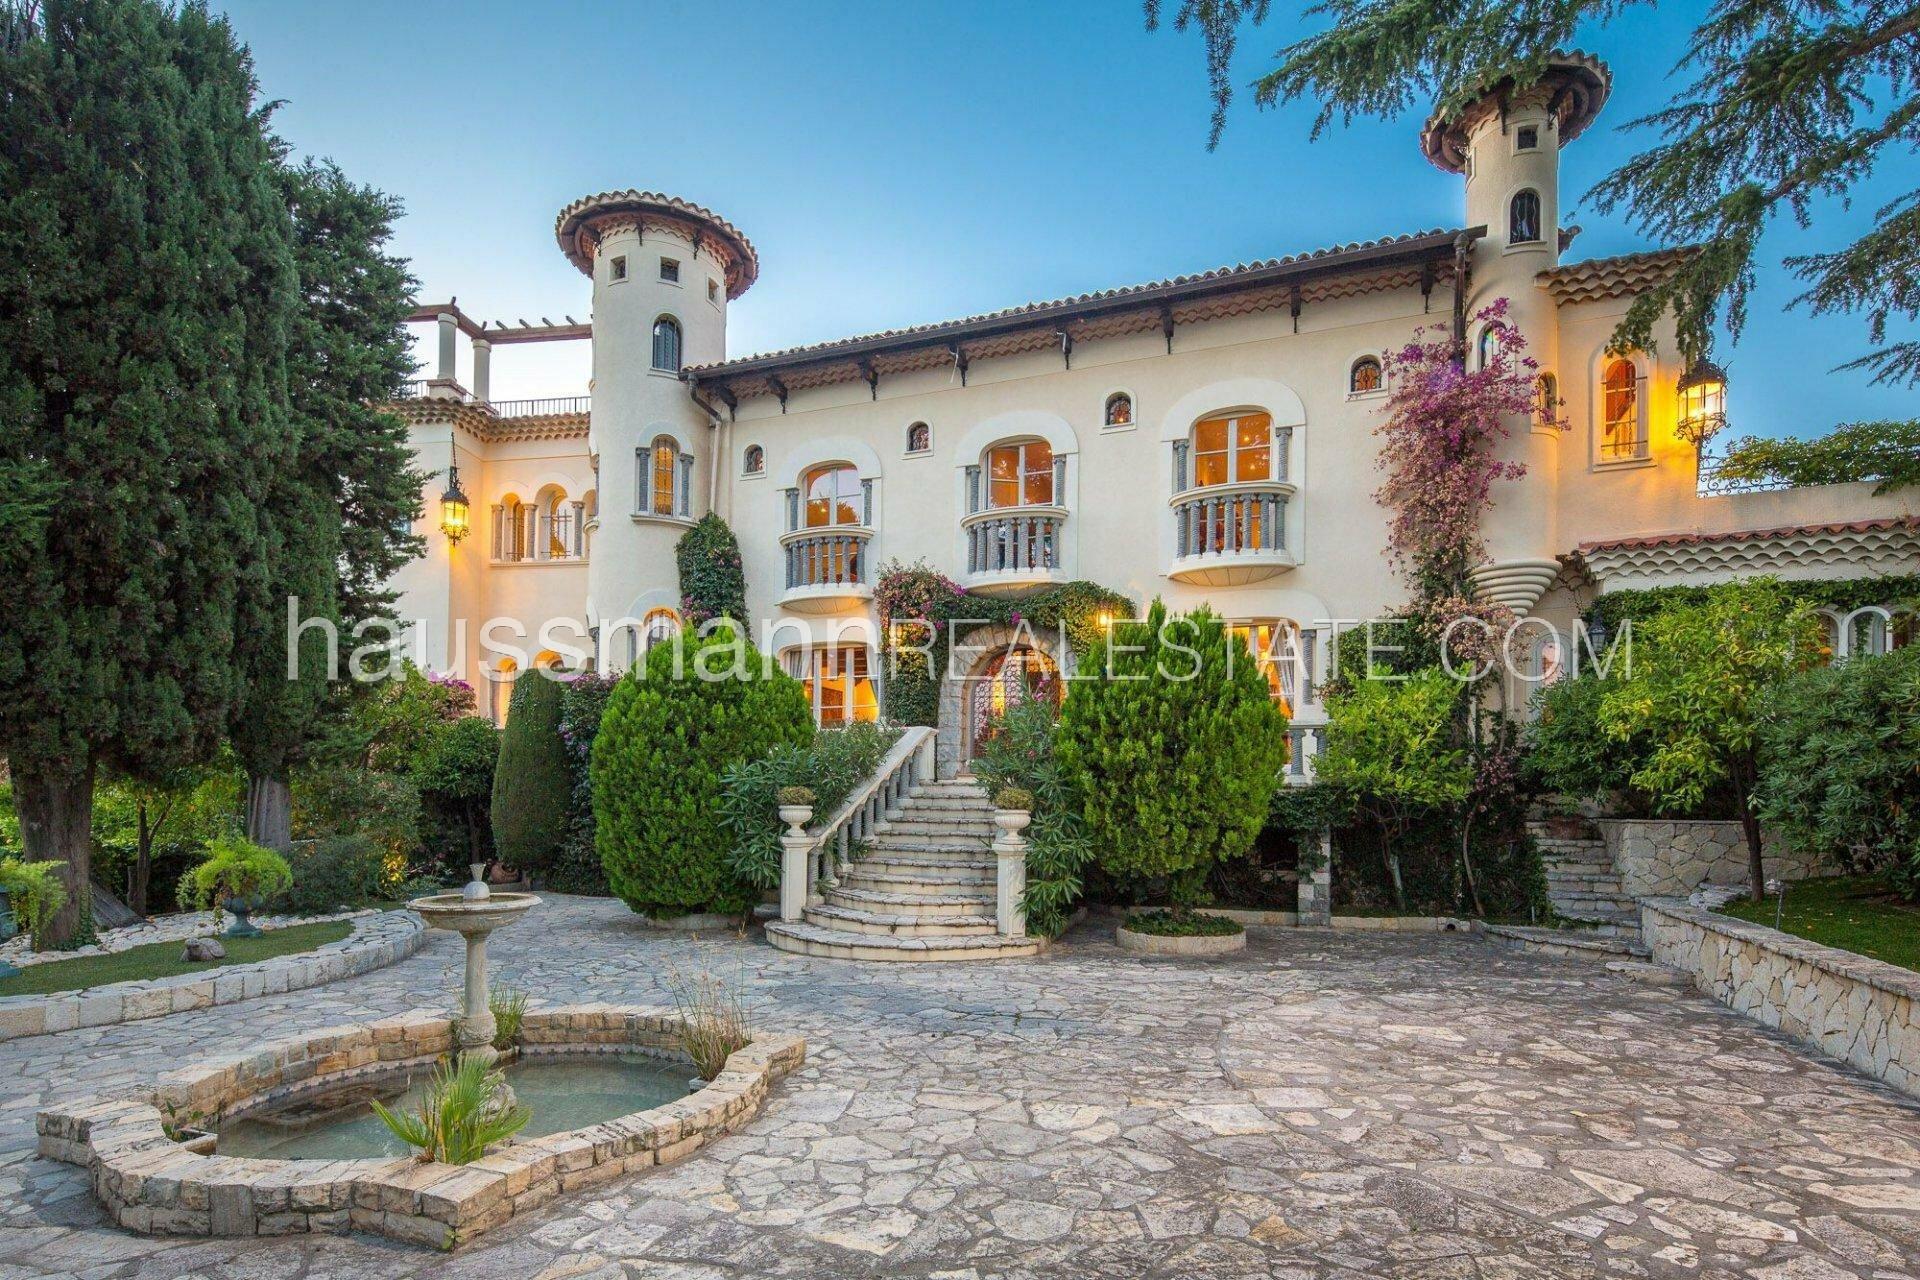 Villa in Nice, Provence-Alpes-Côte d'Azur, France 1 - 11436183